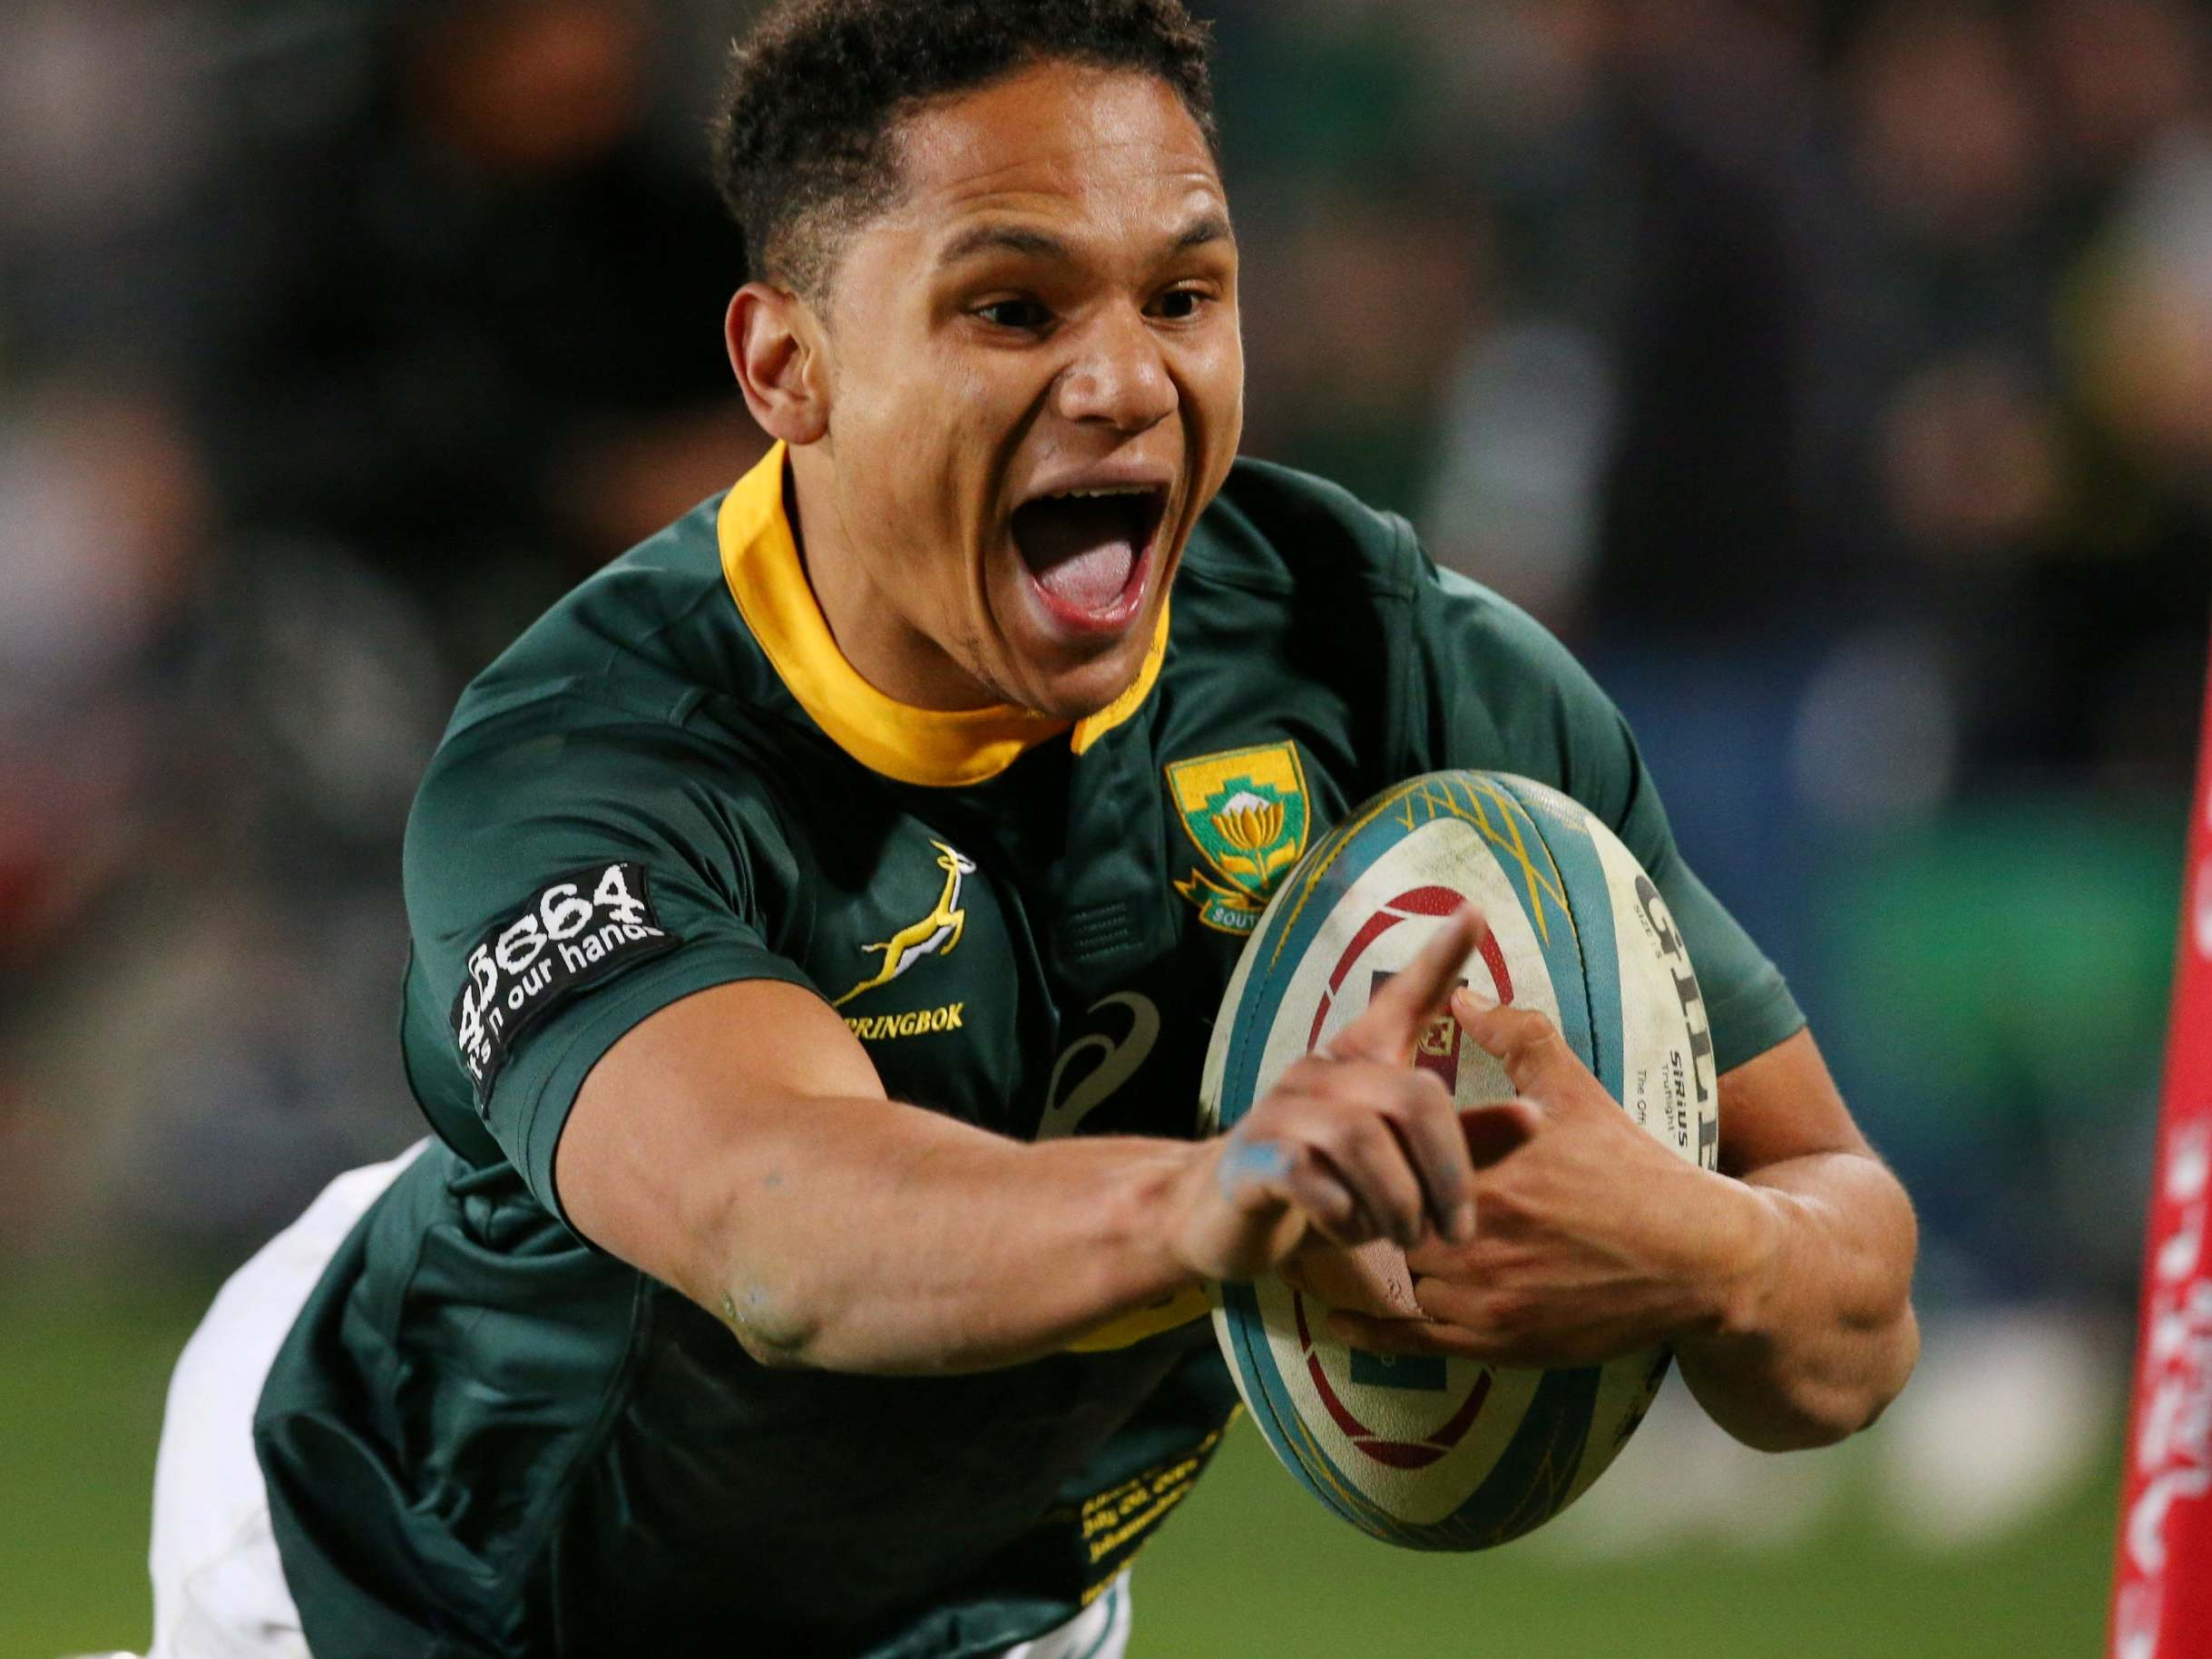 Rugby Championship 2019: Herschel Jantjies enjoys dream debut as South Africa defeat Australia